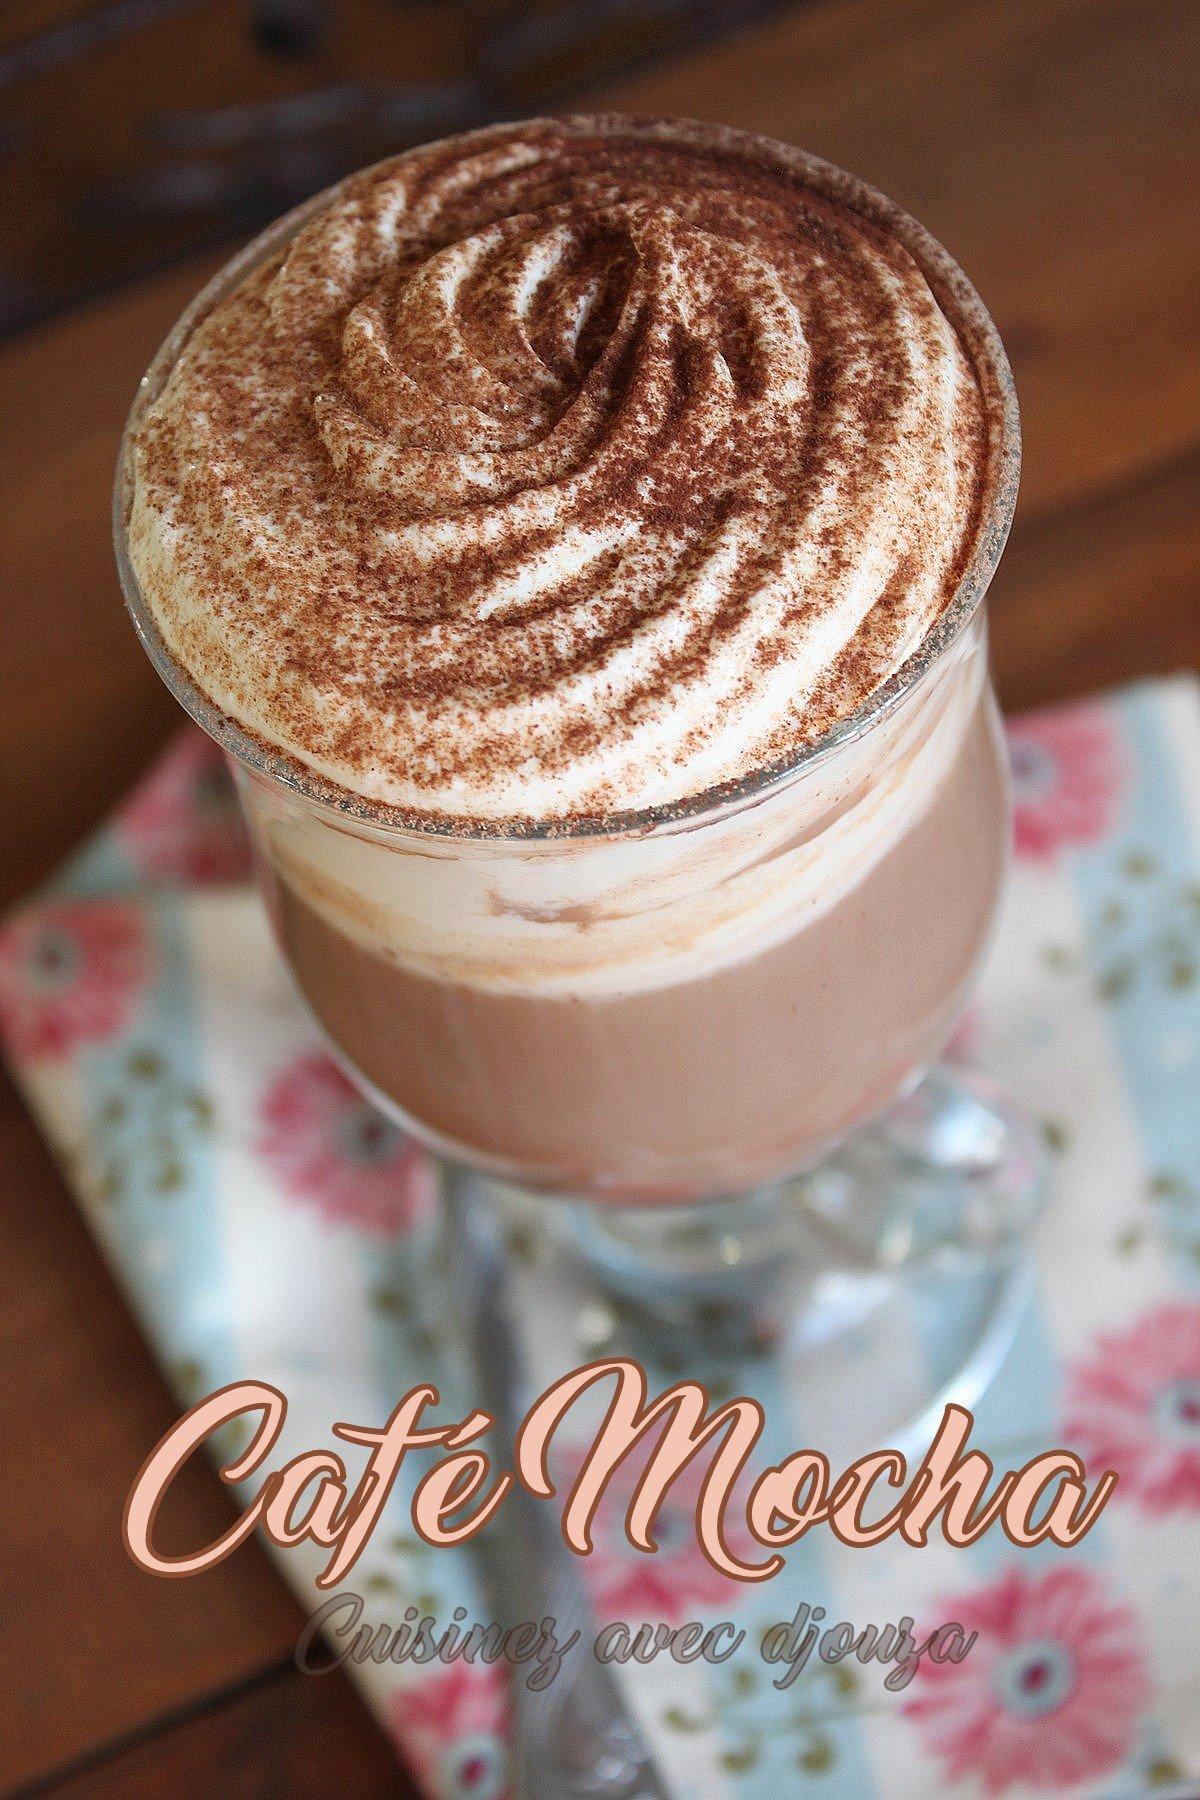 Cafe mocha boisson chaude